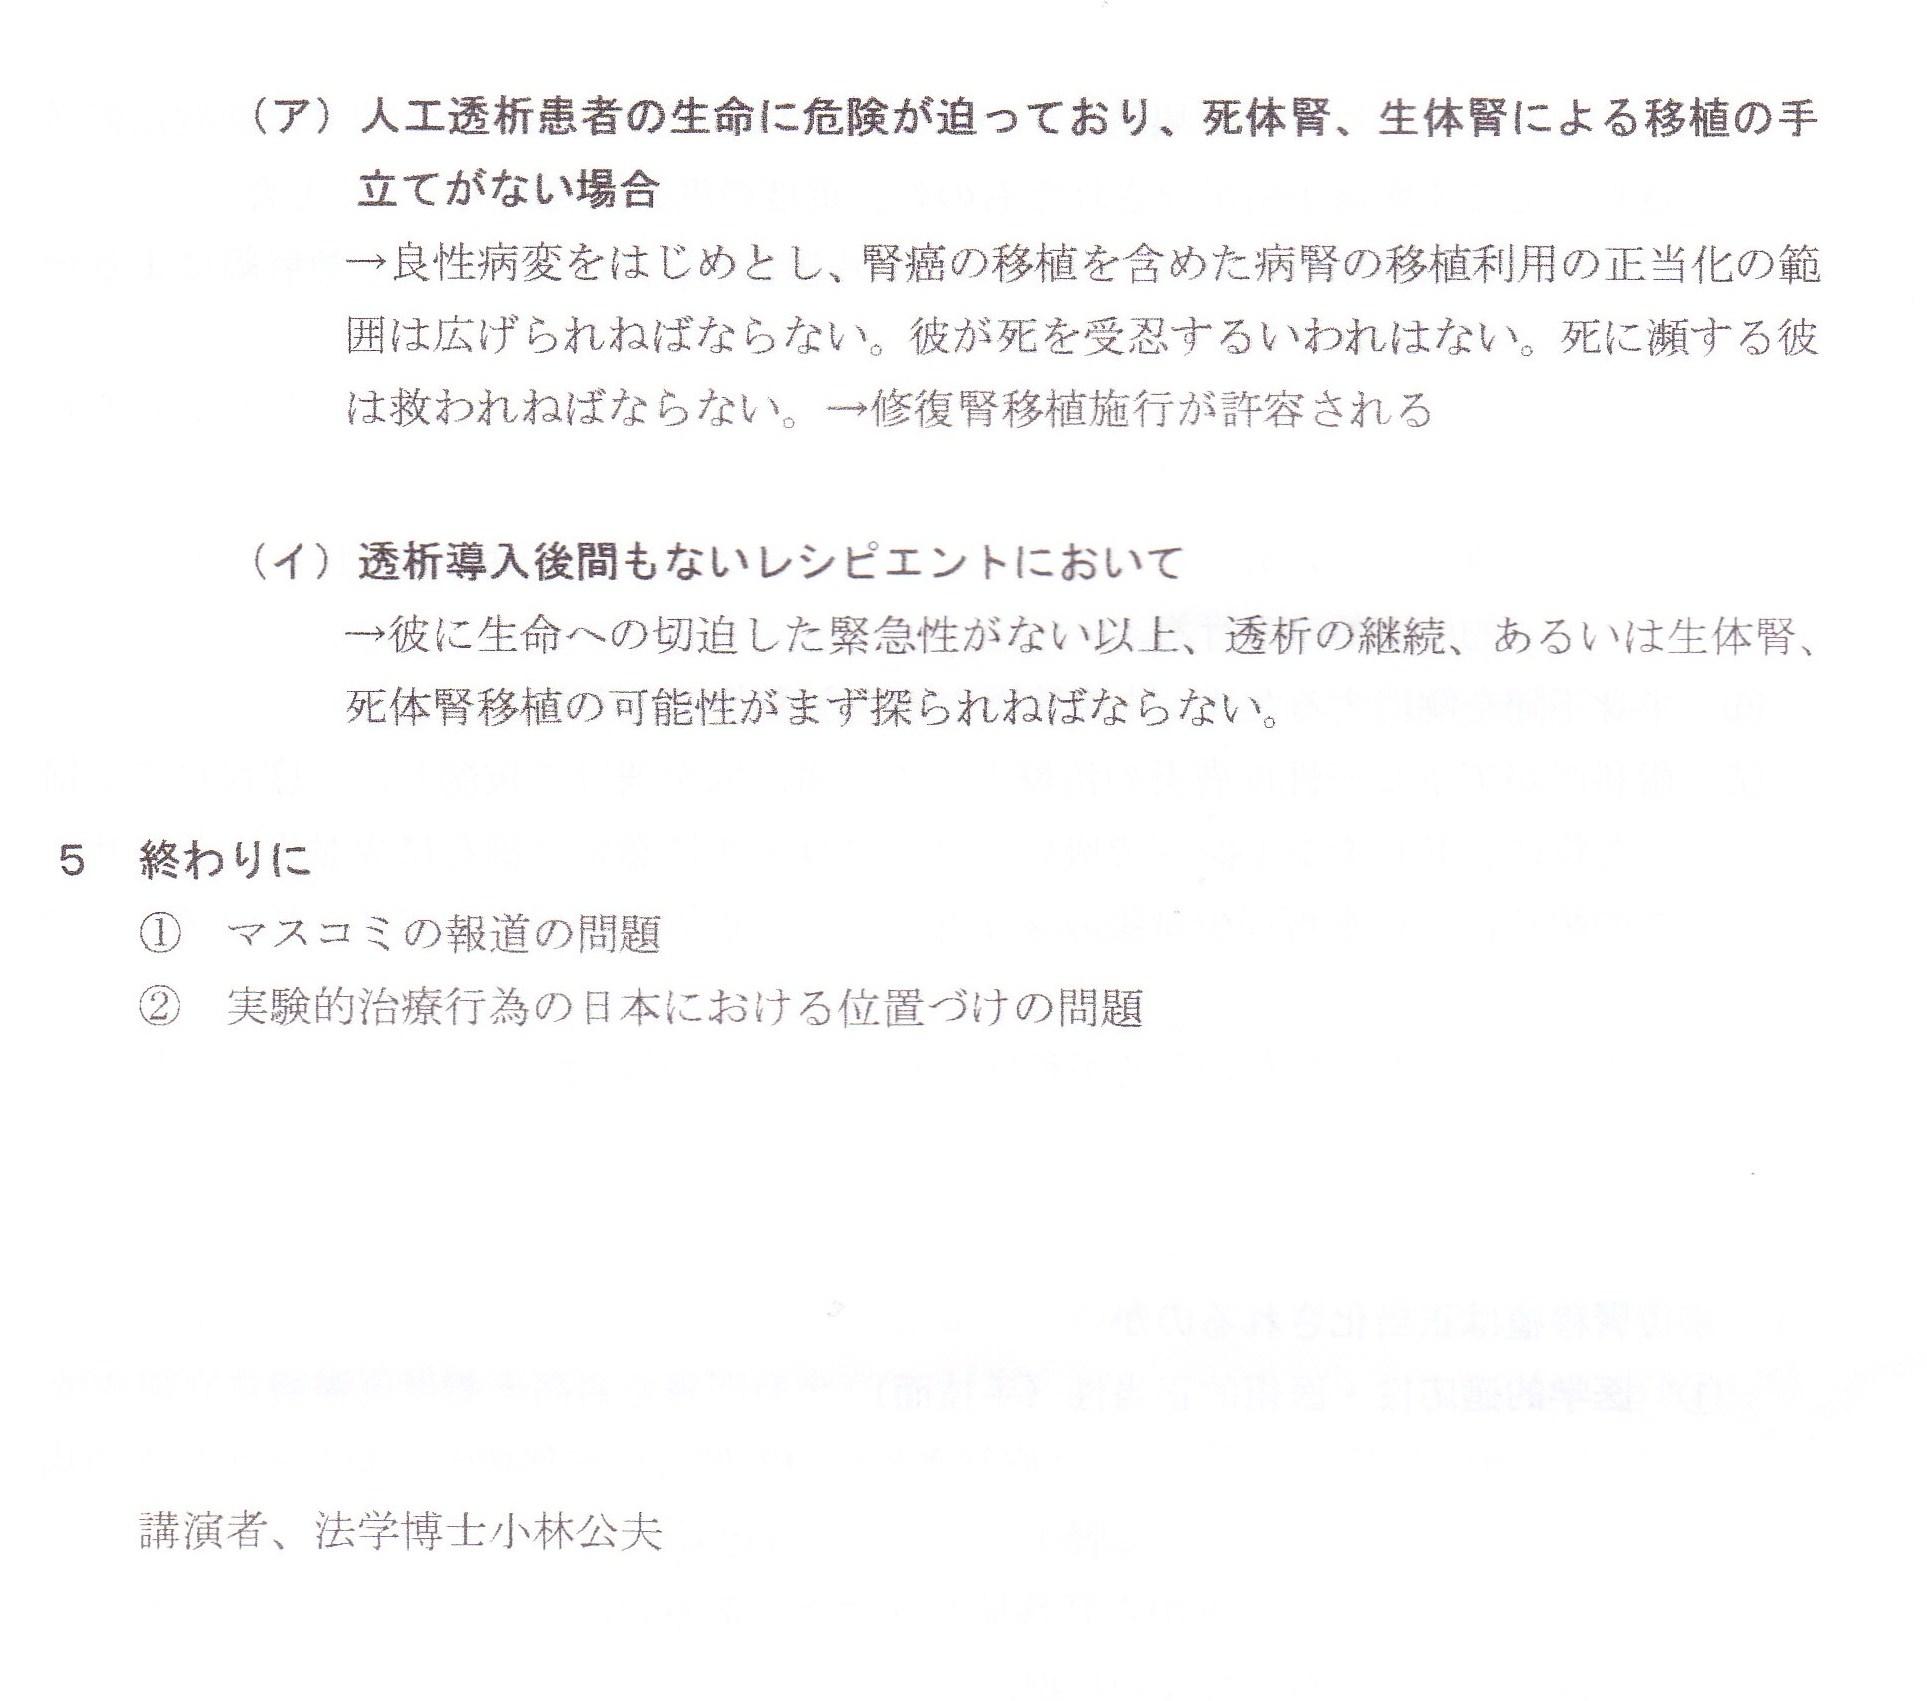 22.5.30NPO法人・第2回総会・記念講演会_e0163726_1574991.jpg